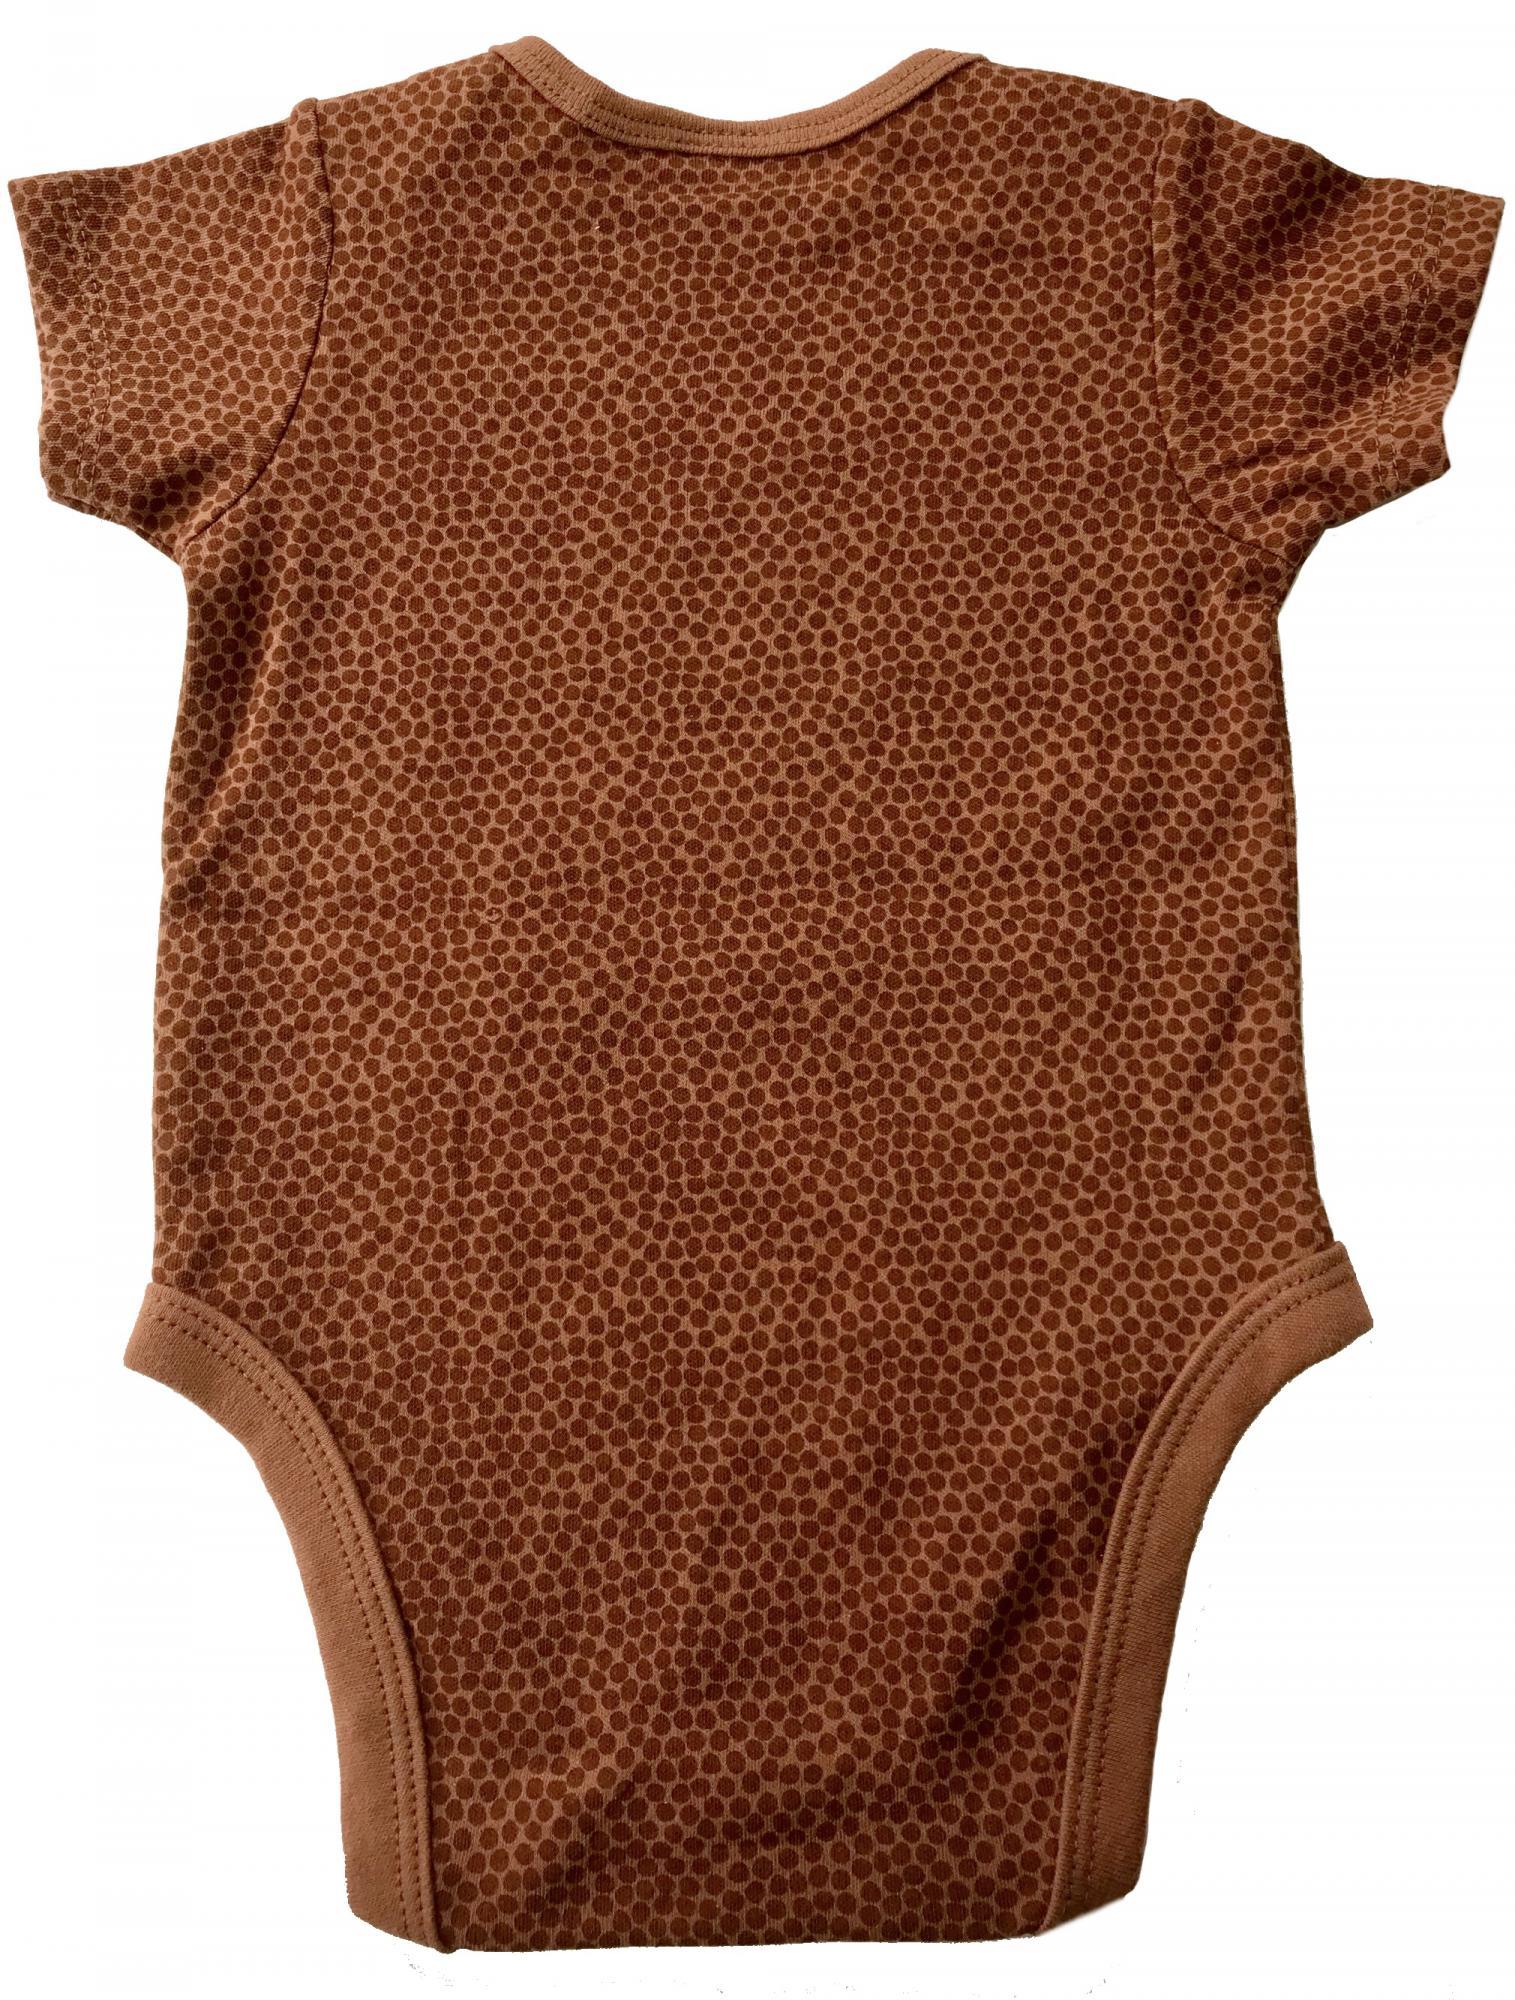 steelers-nfl-football-baby-bodysuit-back.jpg